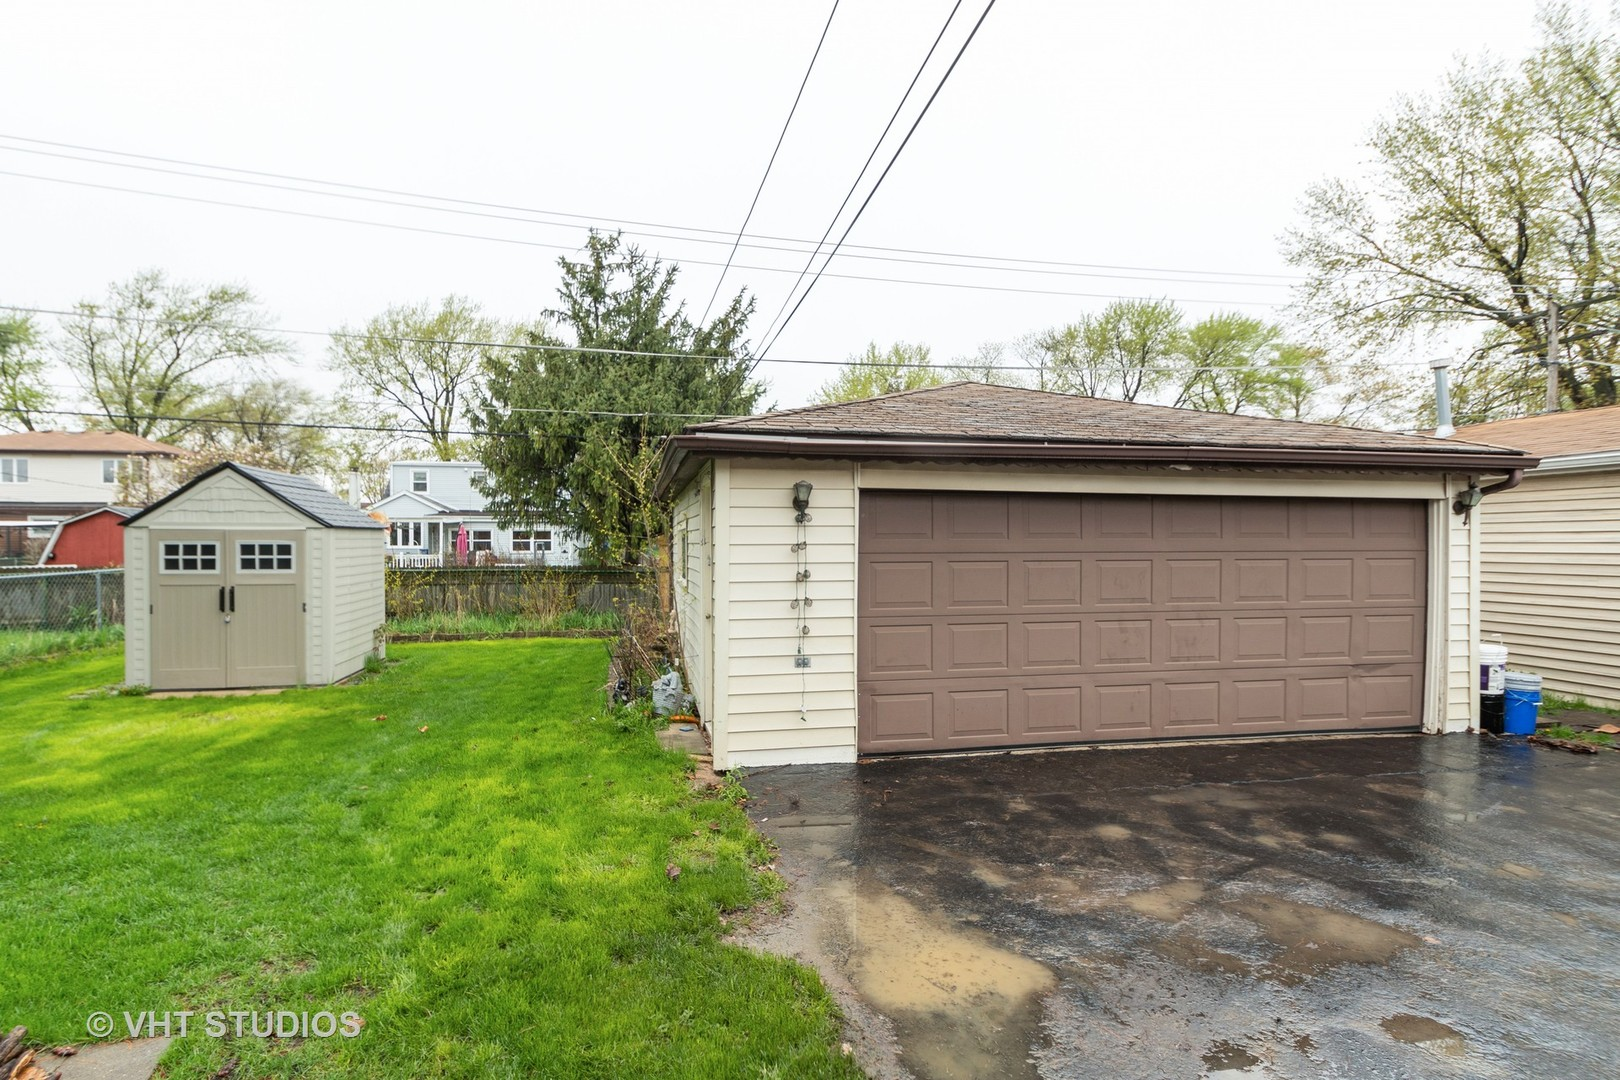 5838 West 81st, Burbank, Illinois, 60459